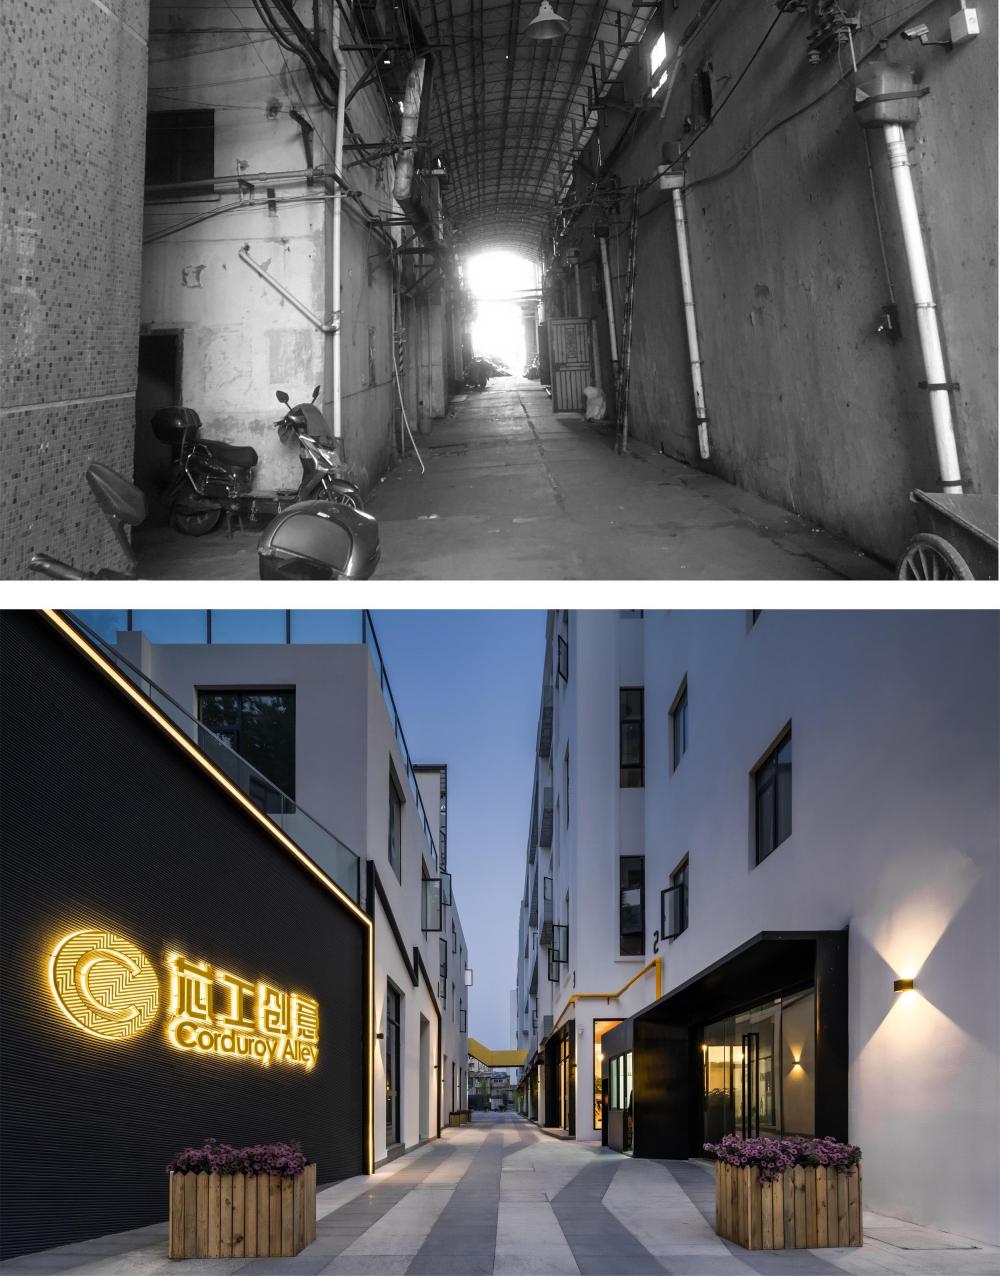 Комплекс Corduroy Alley Park © CreatAR Images/ FTA Group